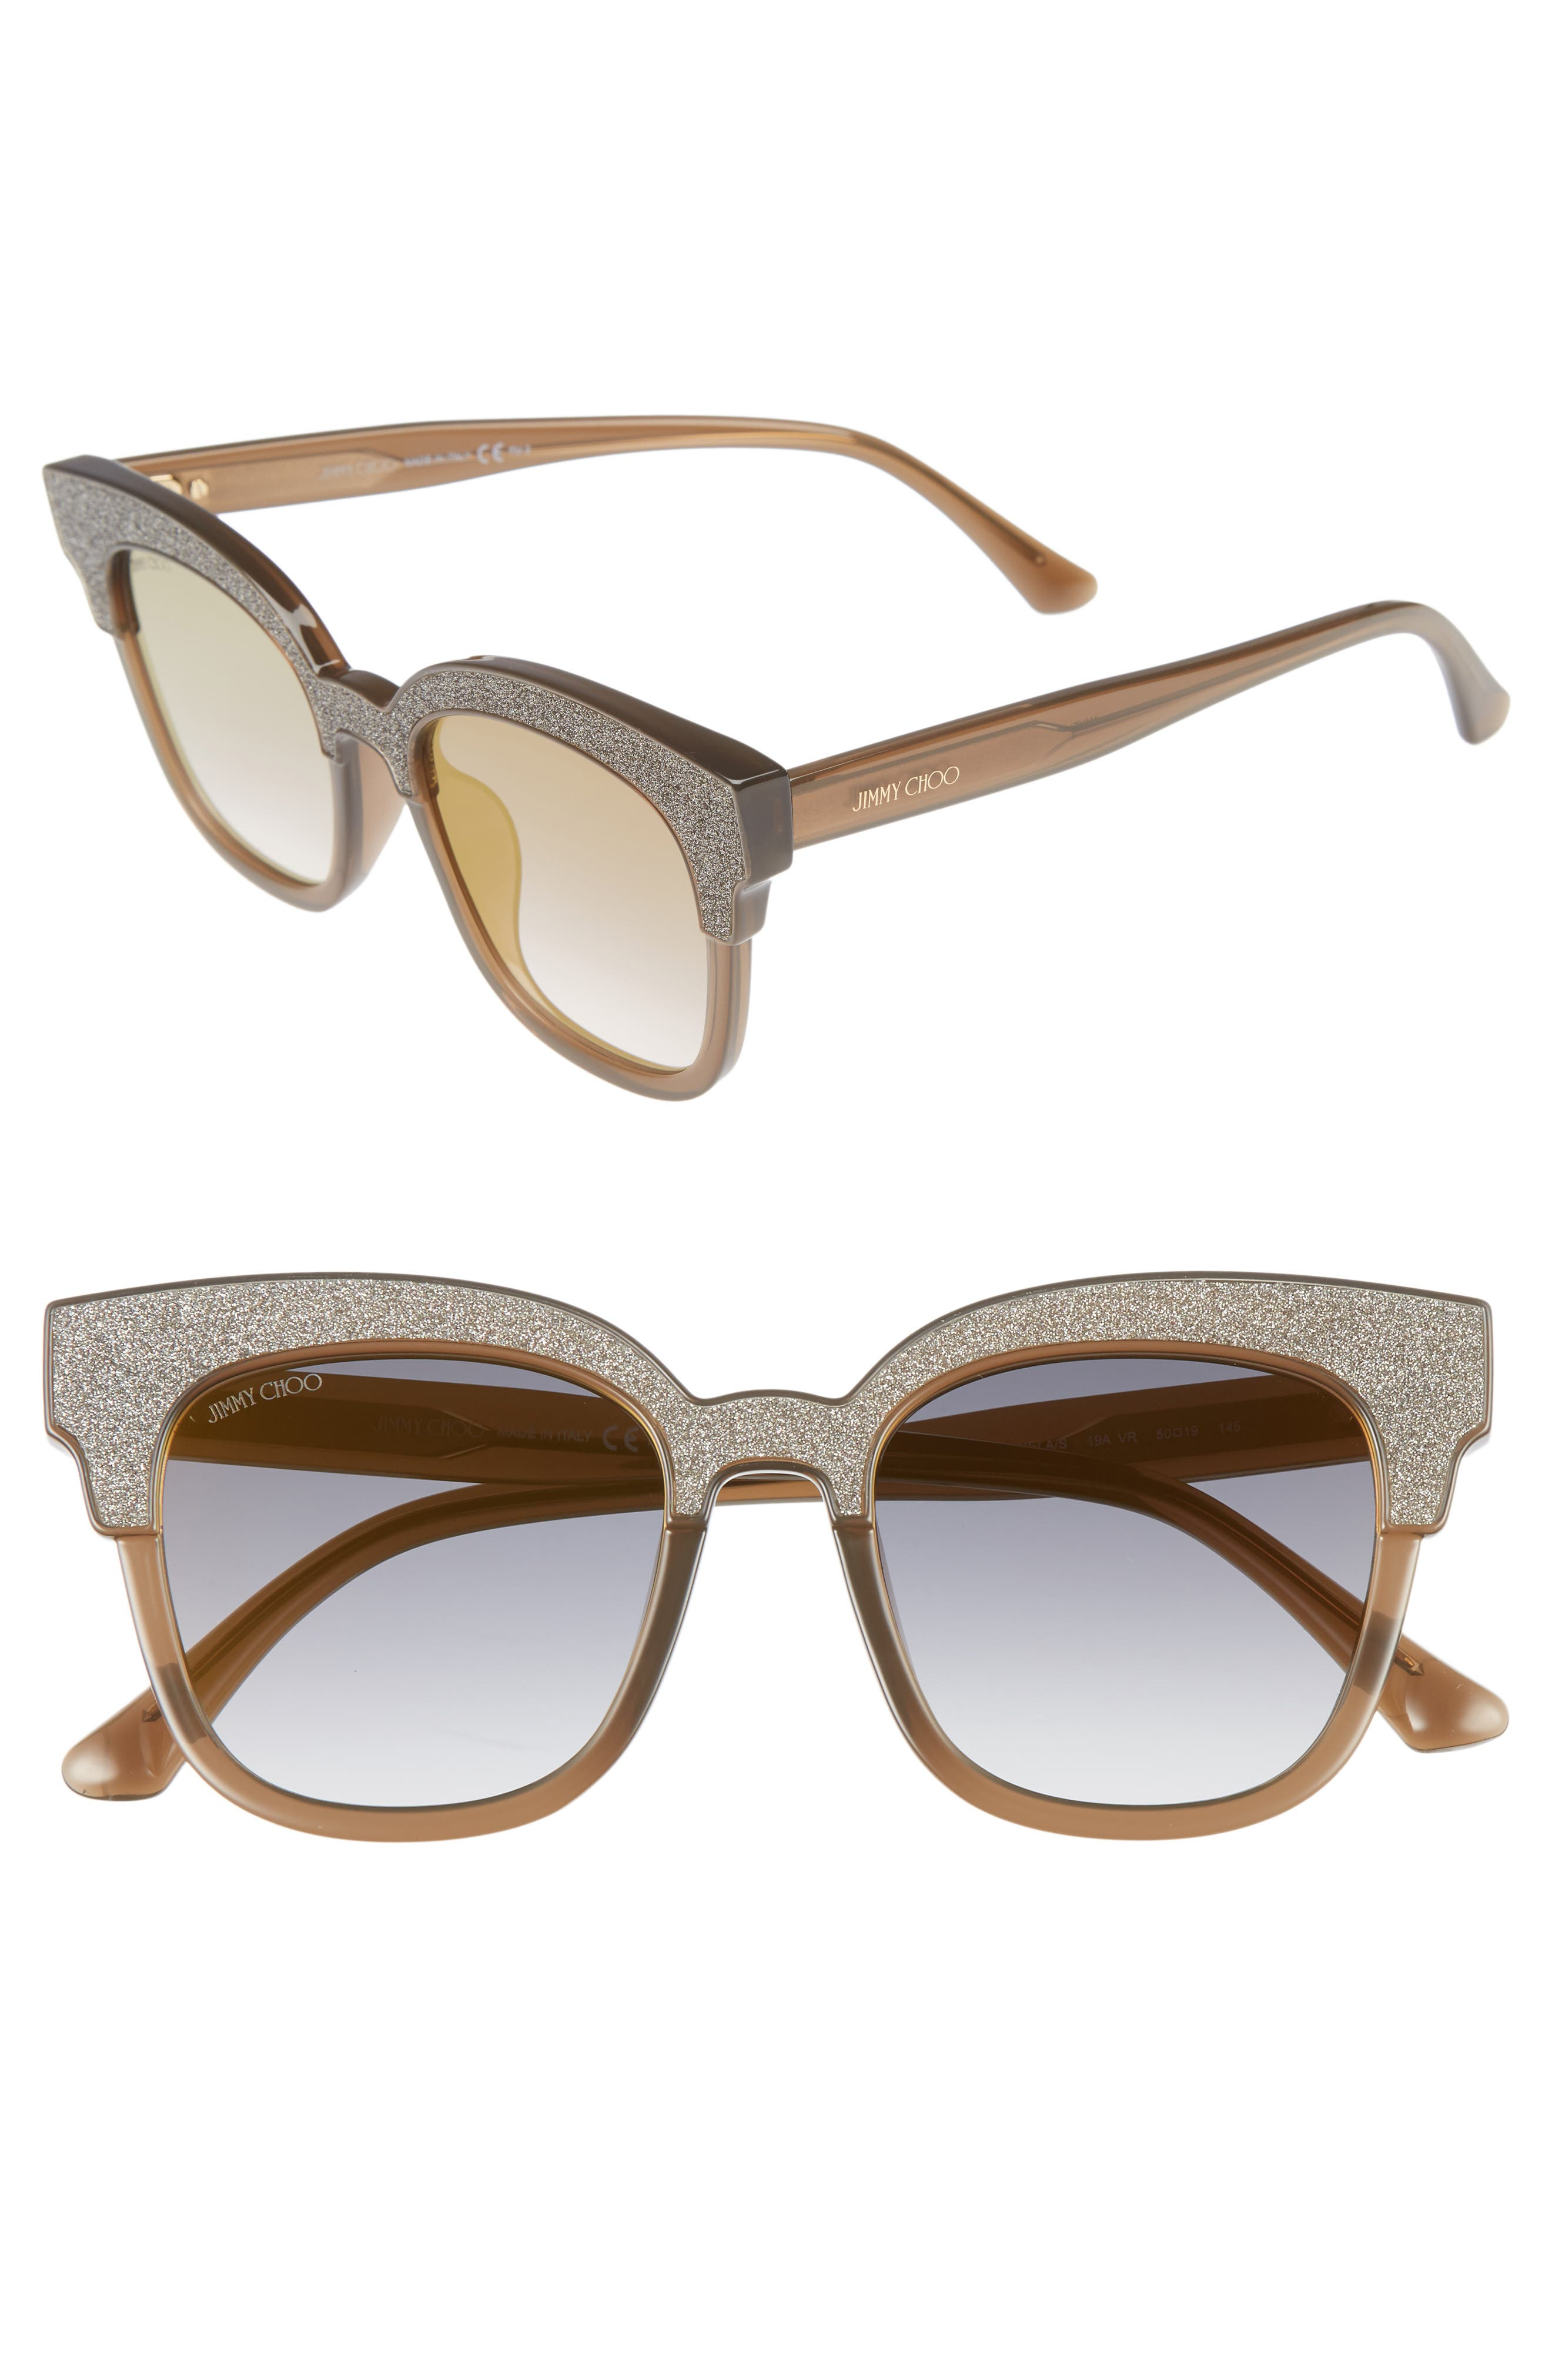 Mayelas 50mm Cat Eye Sunglasses,                             Main thumbnail 1, color,                             Brown/ Glitter